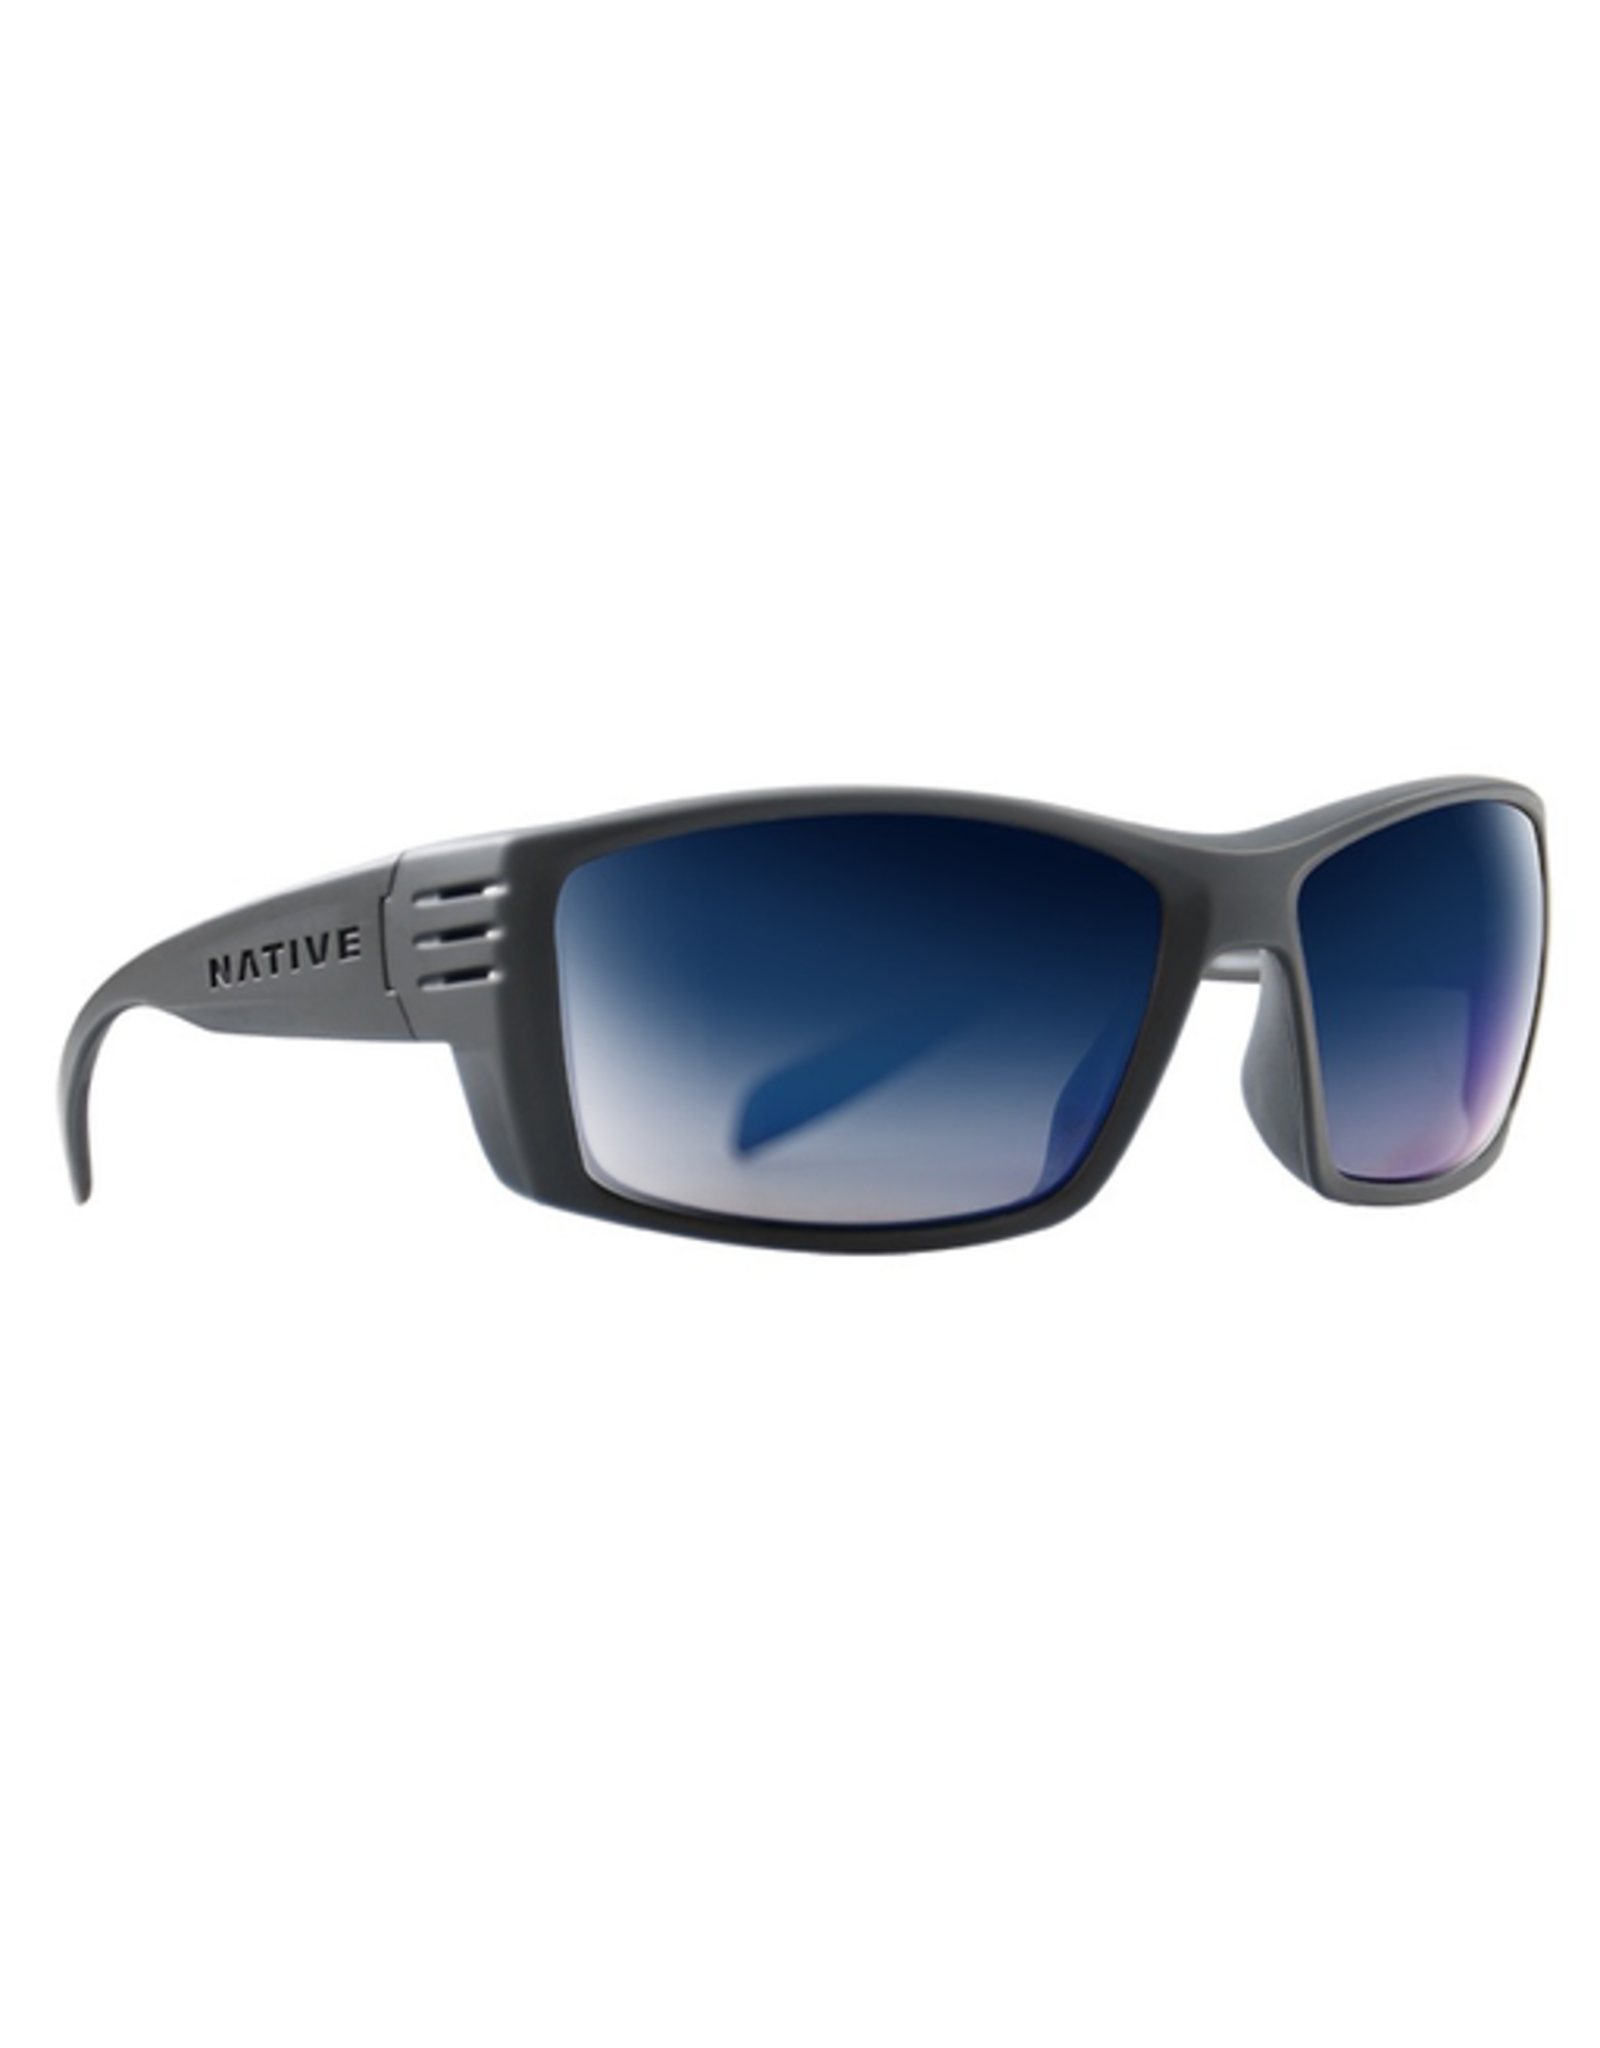 Native Eyewear Native Sunglasses Raghorn, Frame Granite, Lens Blue Reflex